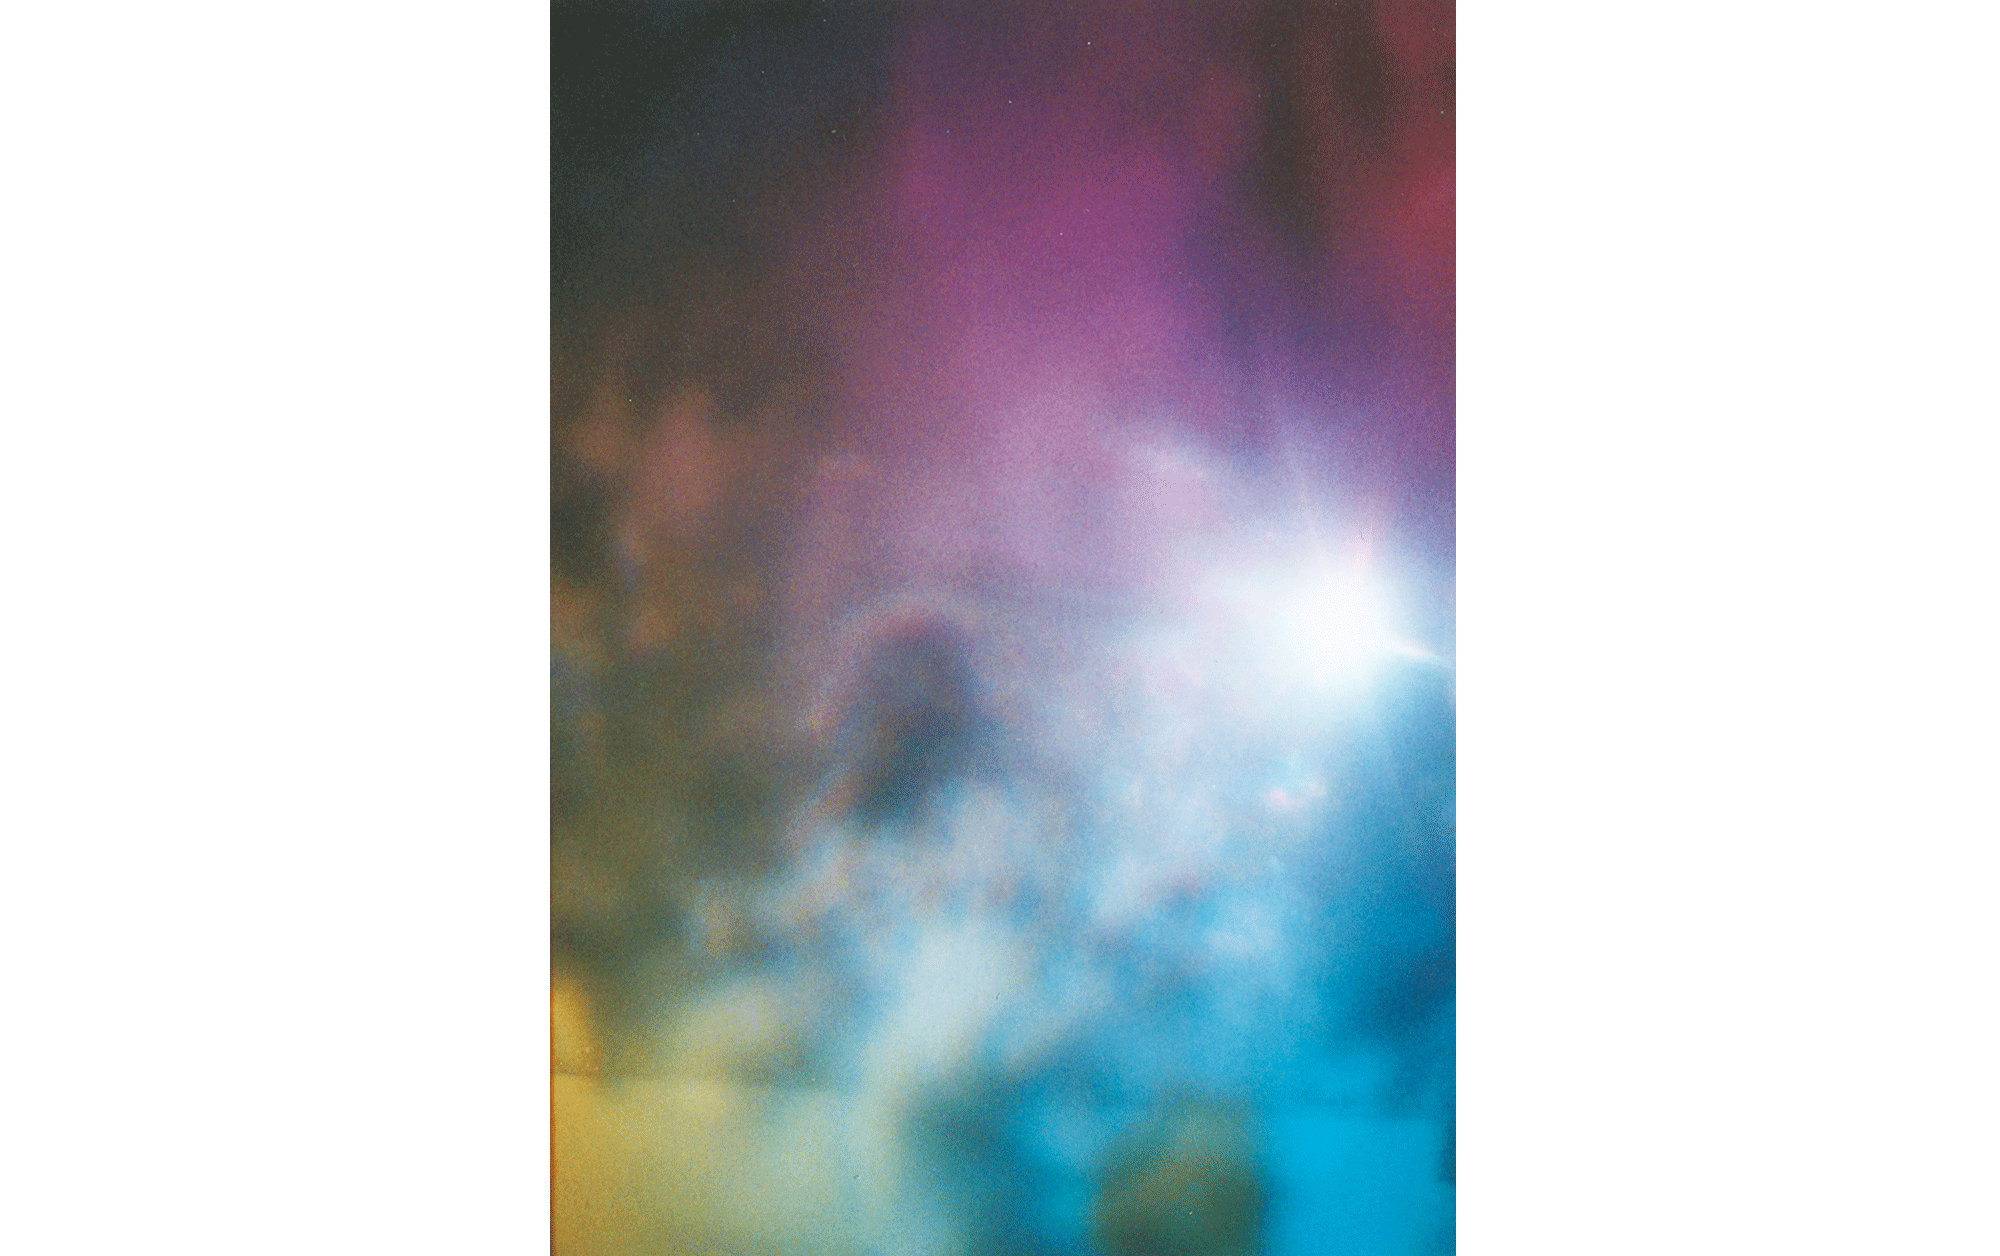 "Hanayo, ""Untitled"", 2017, C-print, 80 x 58.3 cm © Hanayo / Courtesy of Taka Ishii Gallery Photography / Film"